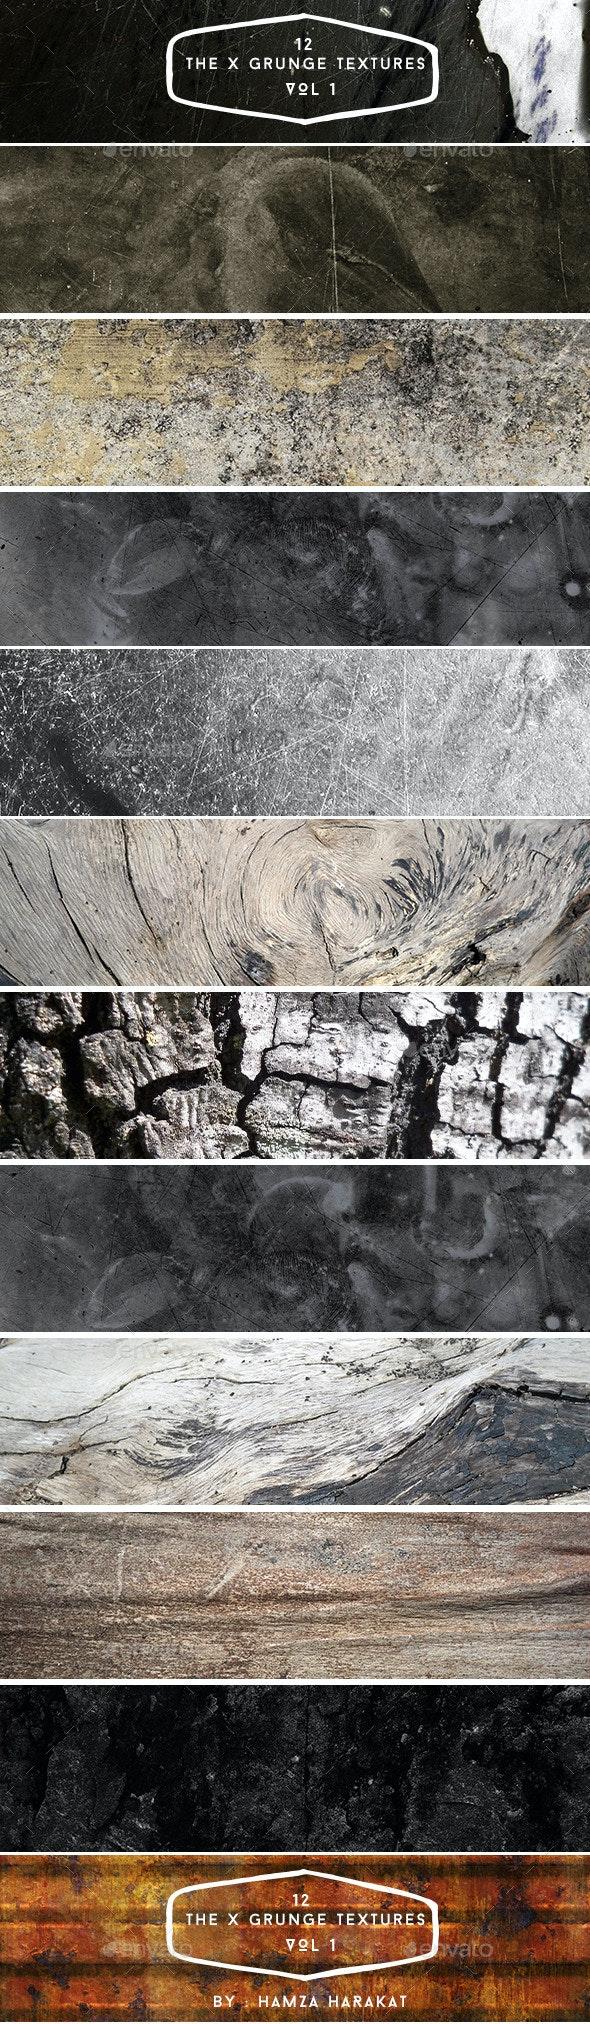 12 The X Grunge Textures VOL 1 - Industrial / Grunge Textures